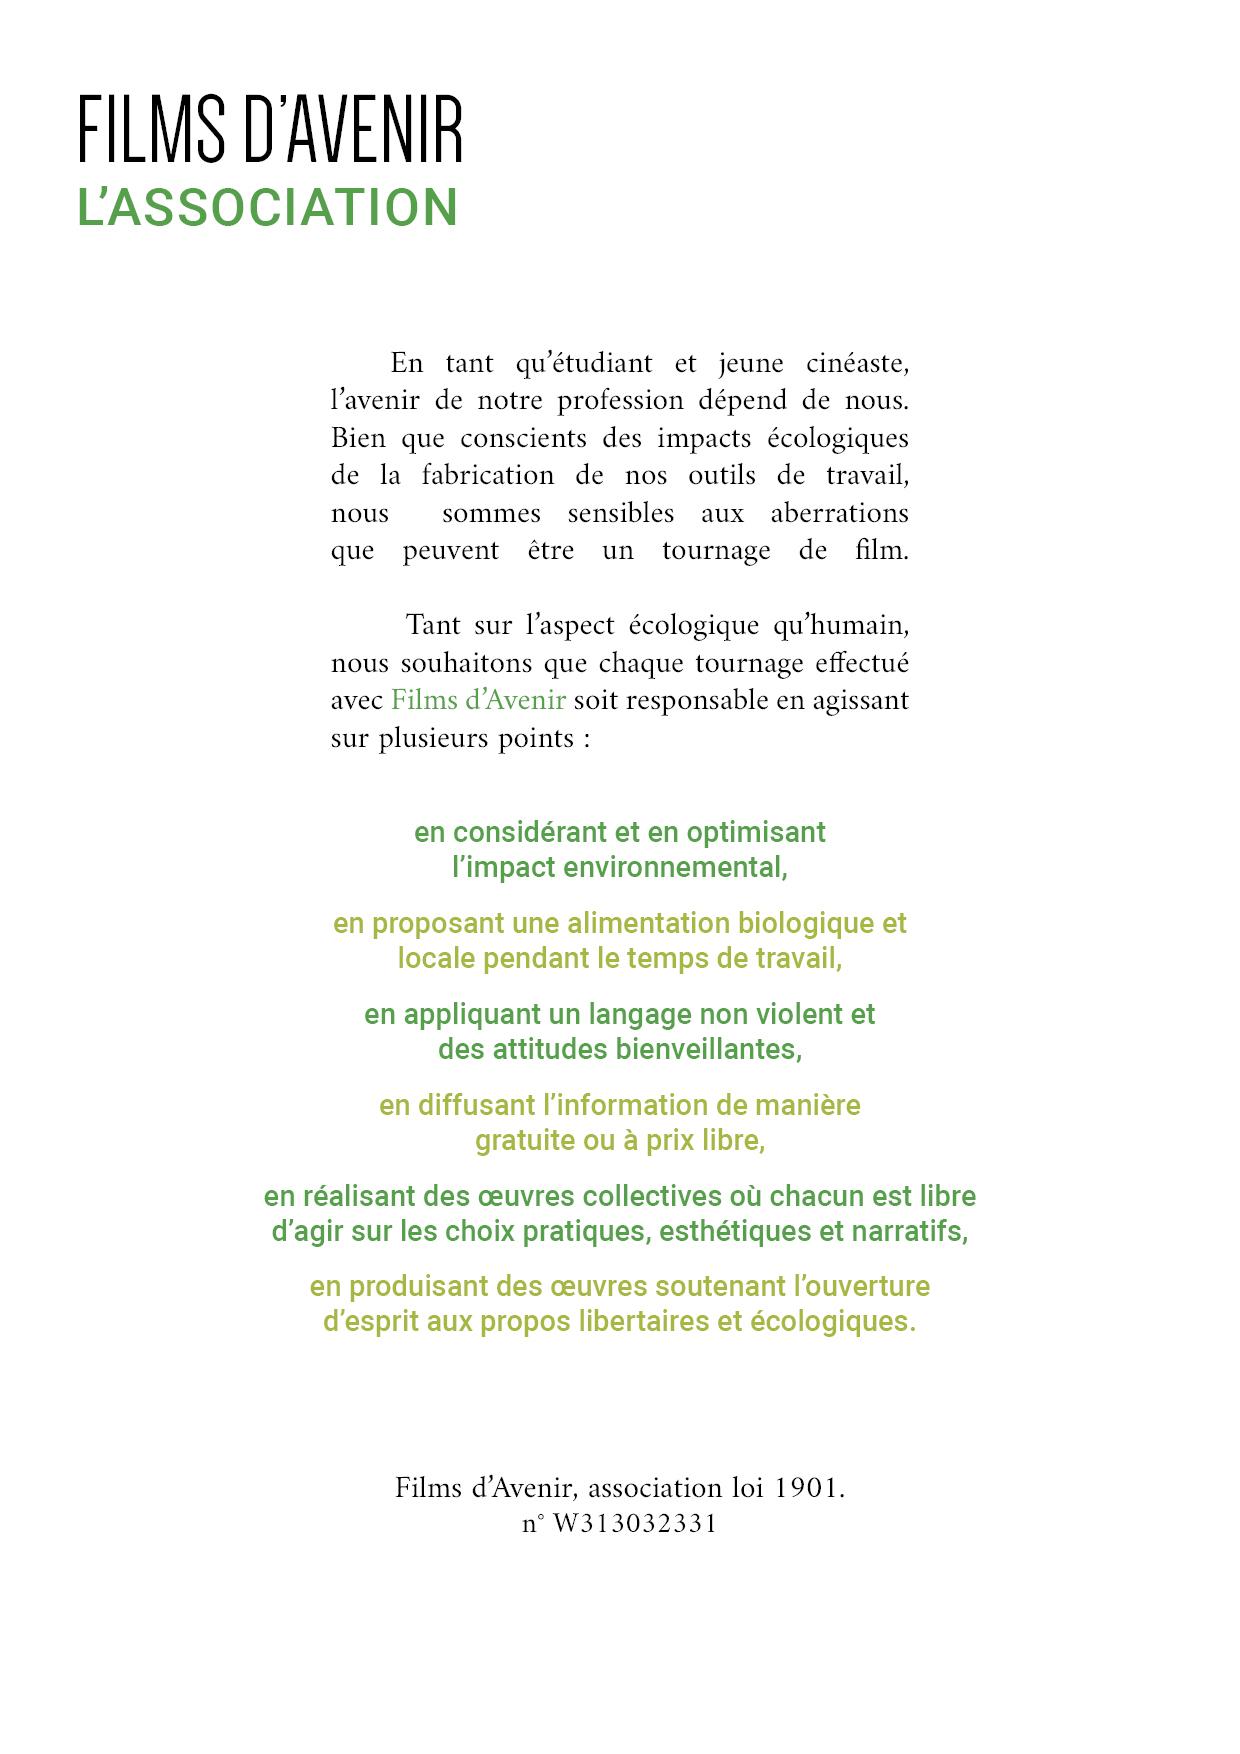 DescriptionA2V-Page9